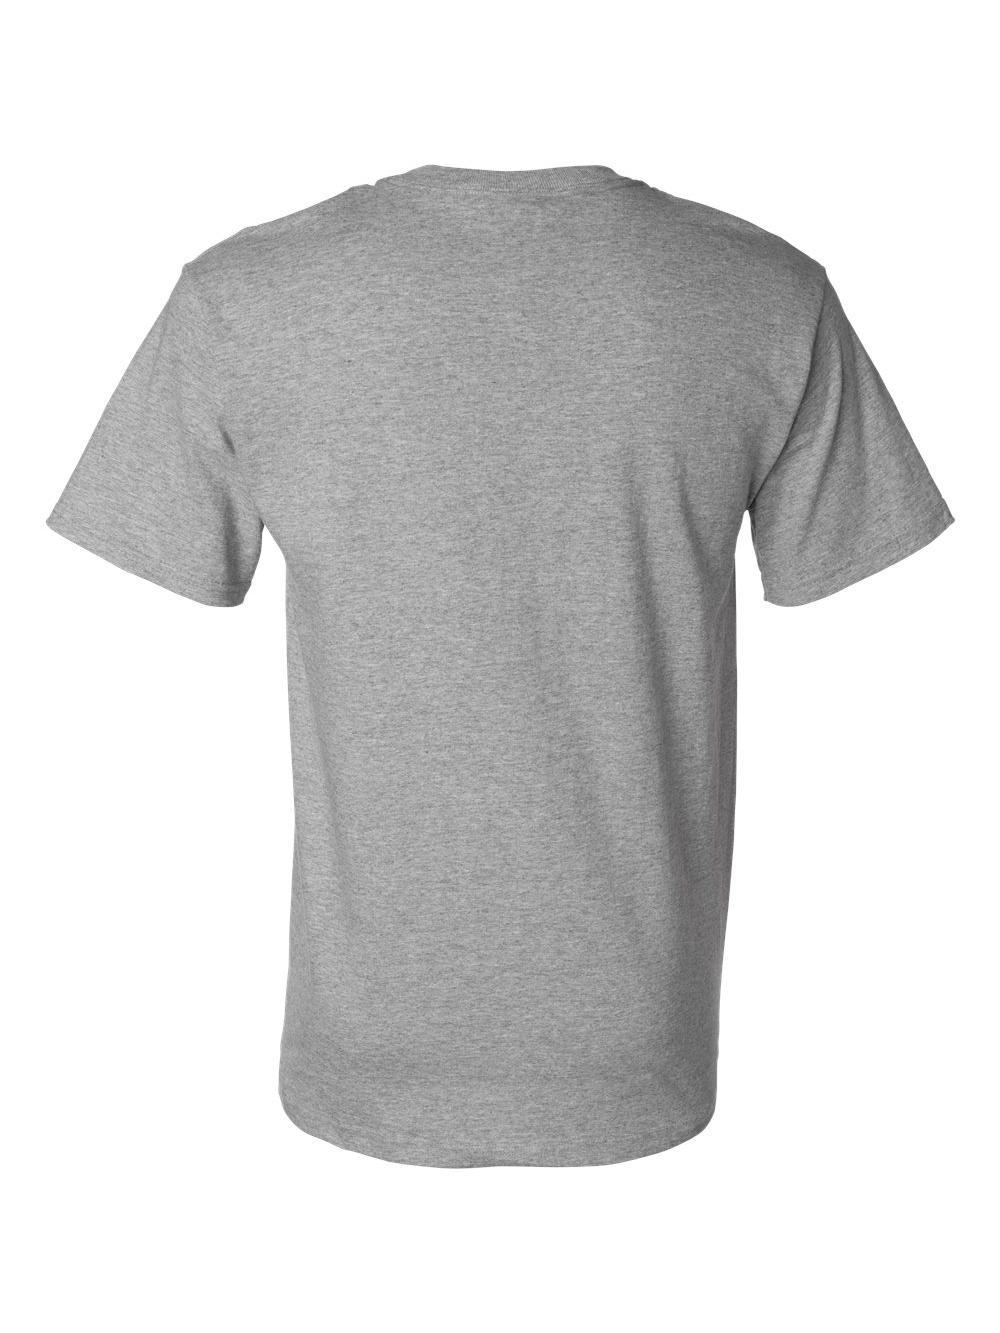 Fruit-of-the-Loom-HD-Cotton-Short-Sleeve-T-Shirt-3930R thumbnail 13